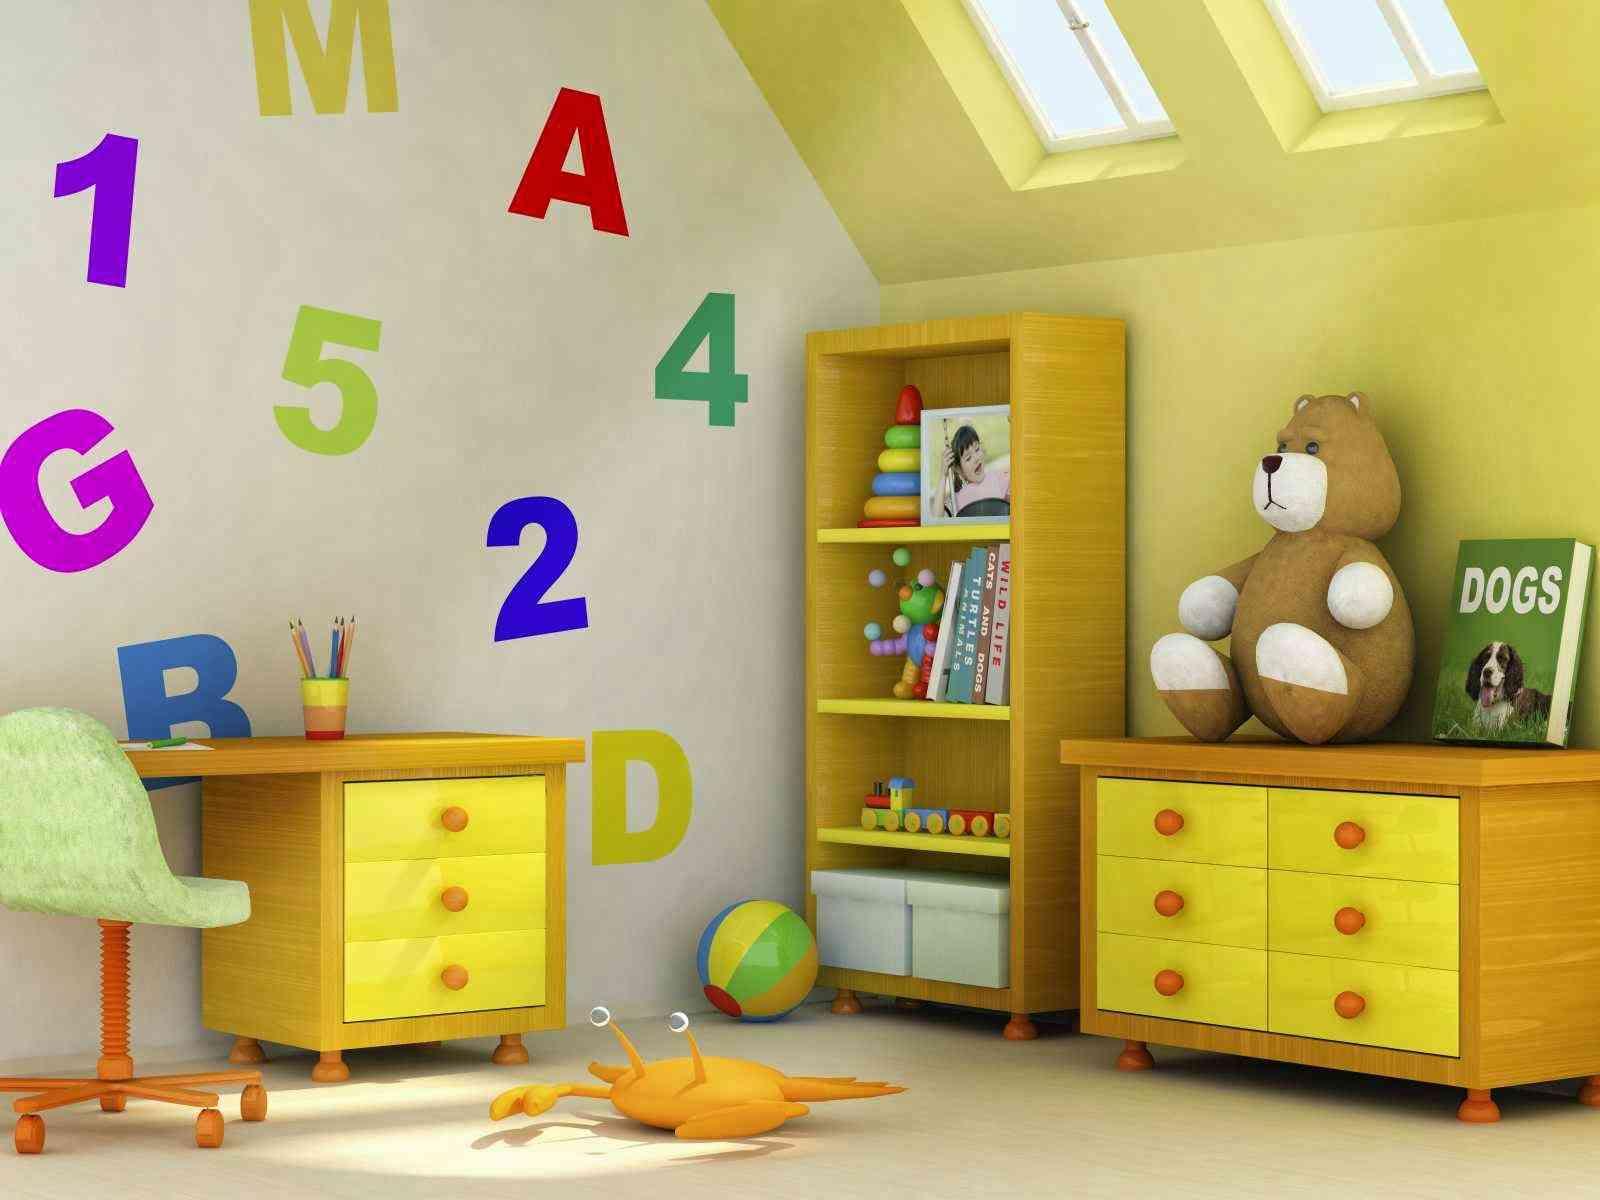 Decora una habitaci n infantil 6 seguros pasos - Decorar habitacion infantil ...